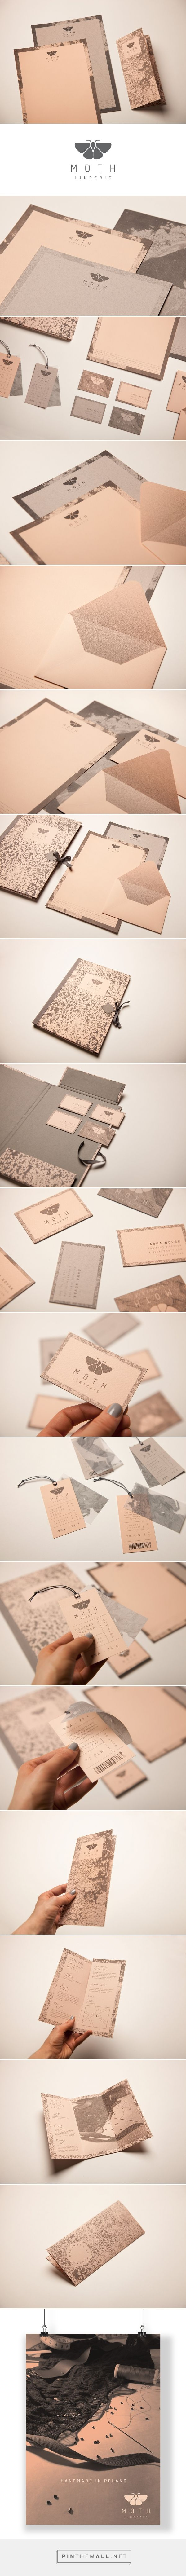 MOTH Lingerie Branding by Katarzyna Wieteska on Behance | Fivestar Branding – Design and Branding Agency & Inspiration Gallery